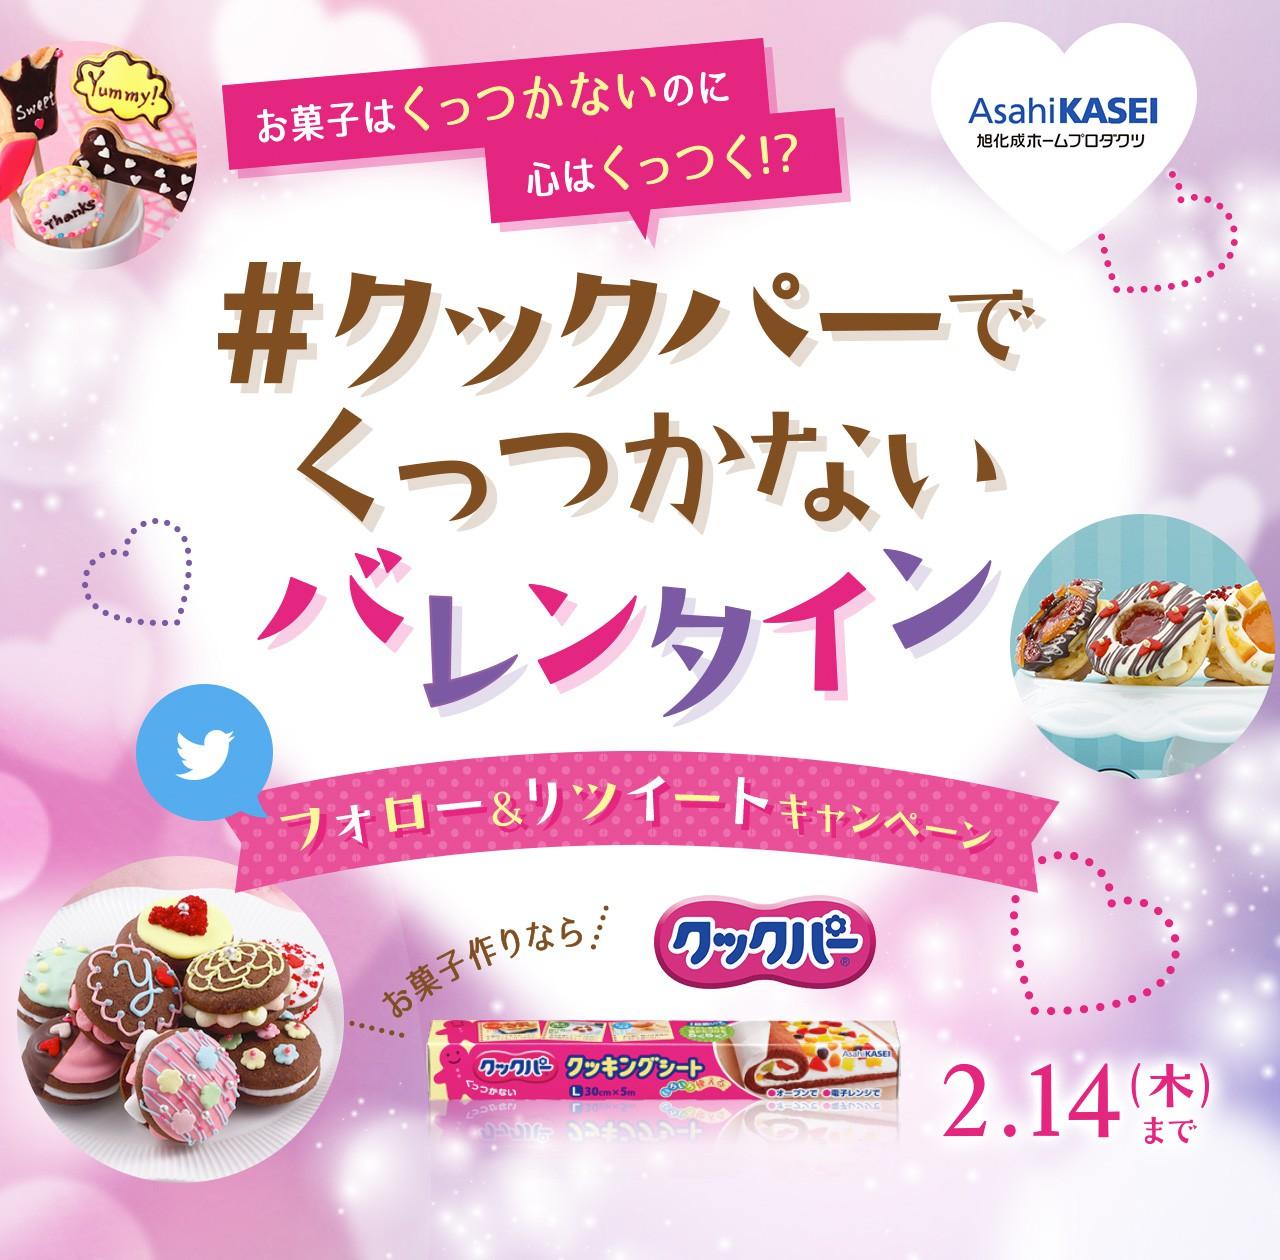 twitter-campaign-valentines-day-cookper